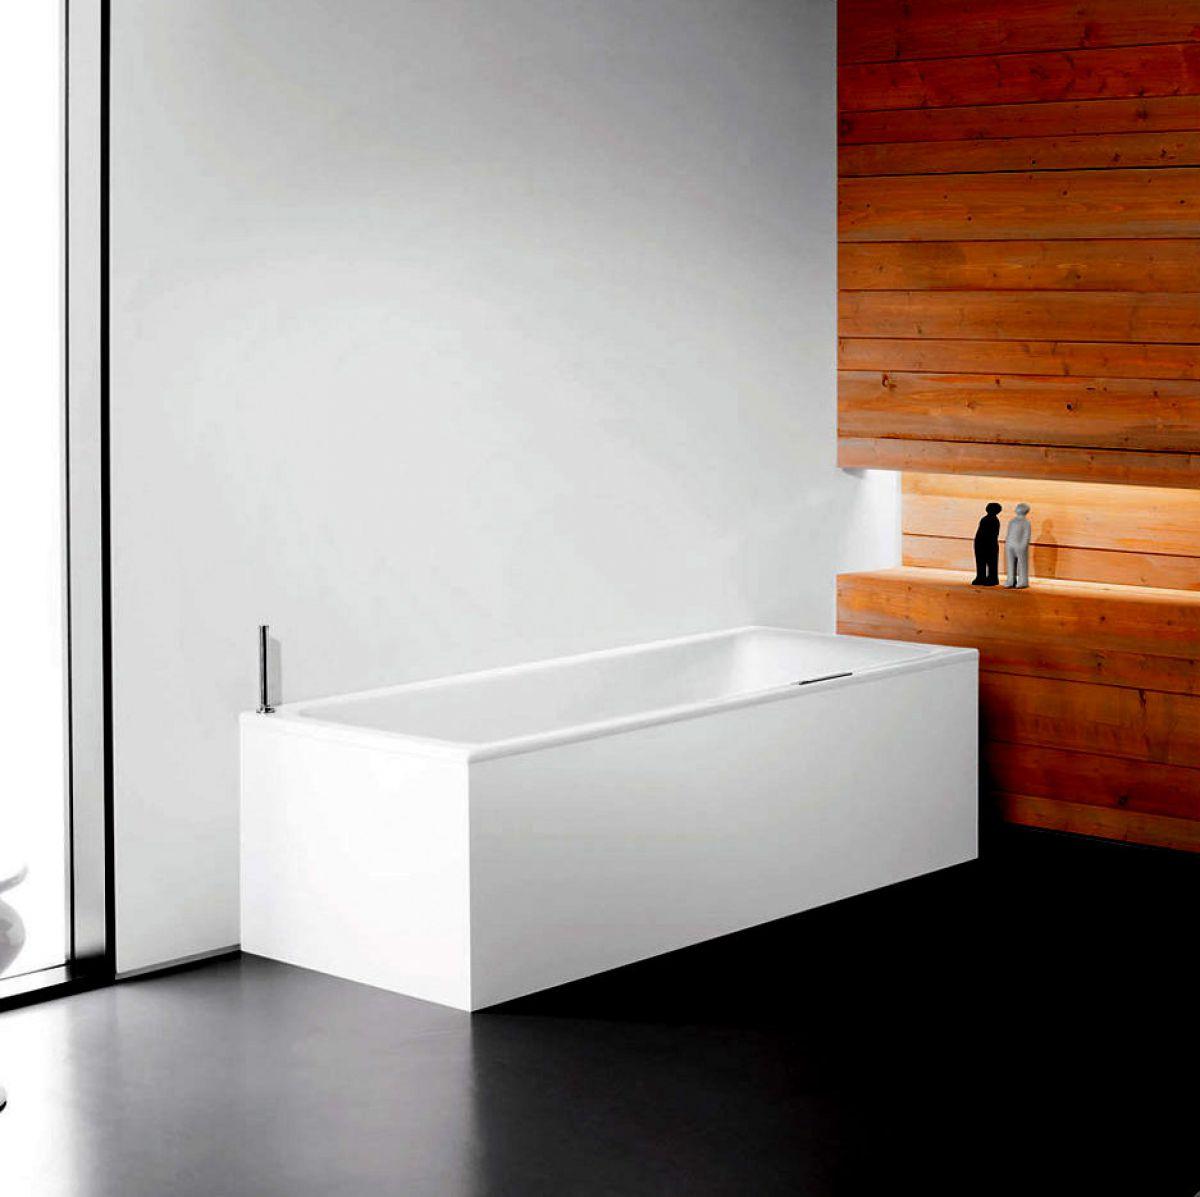 Kaldewei Puro Duo Double Ended Bath Uk Bathrooms